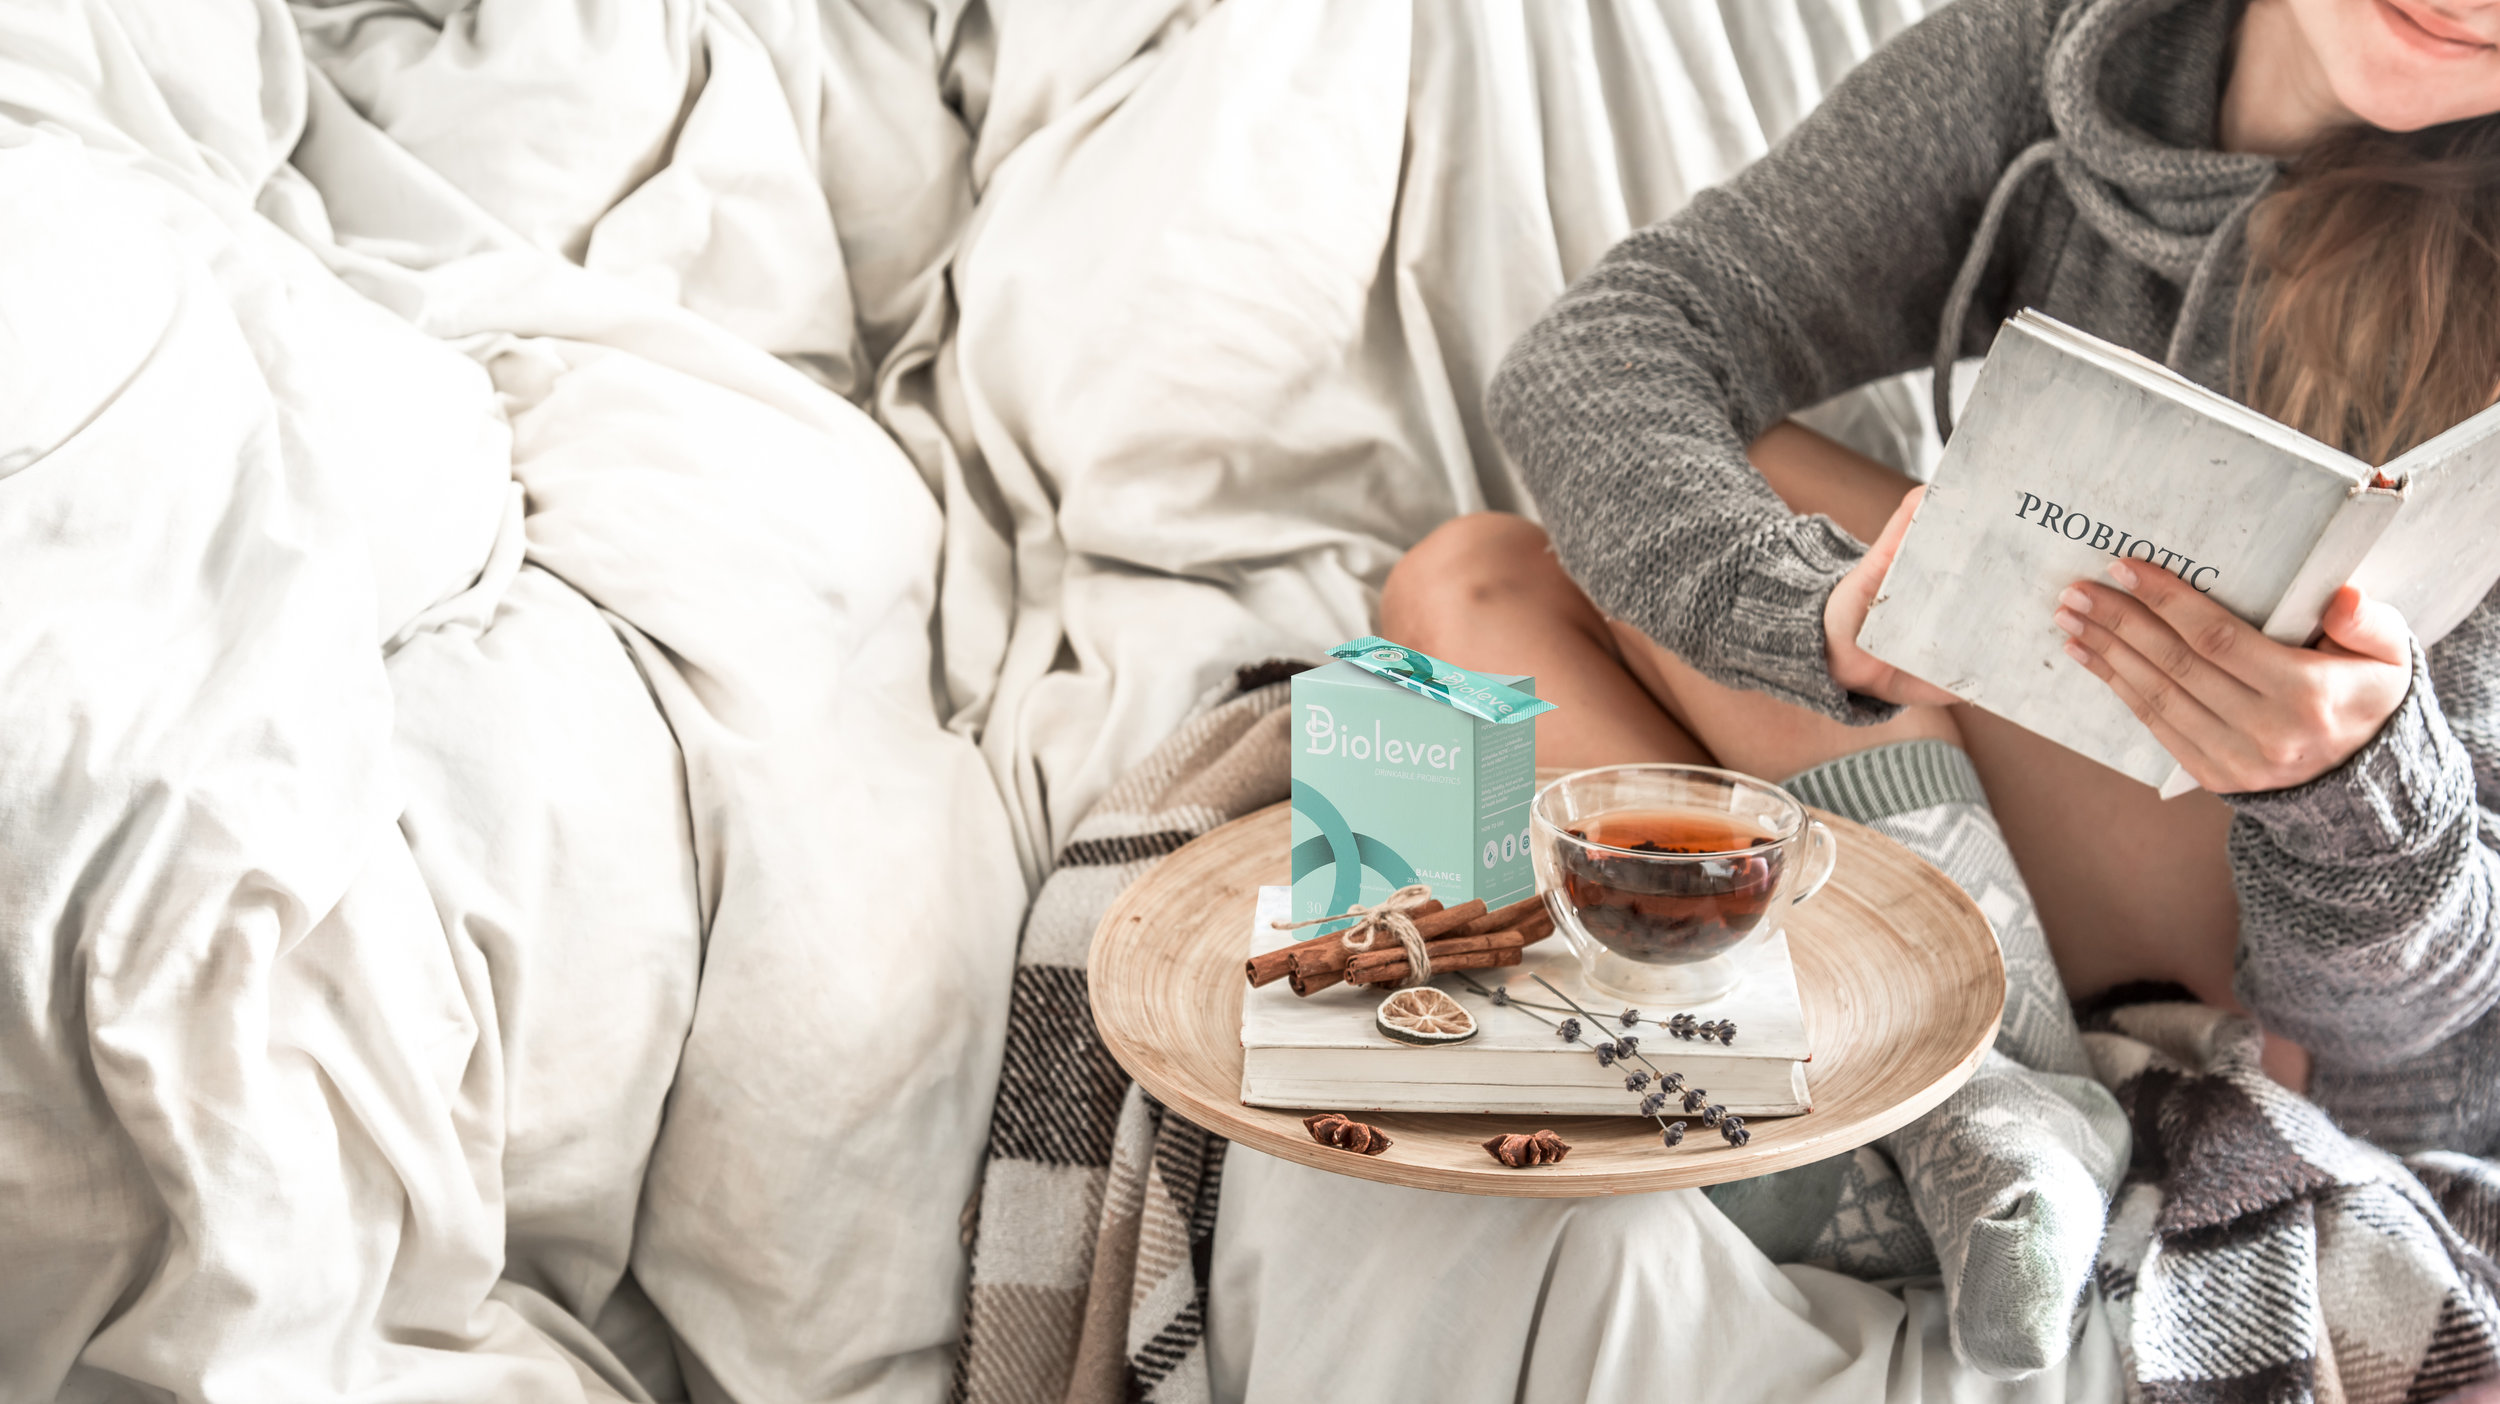 Biolever Balance probiotics Fight Allergies and Hay Fever